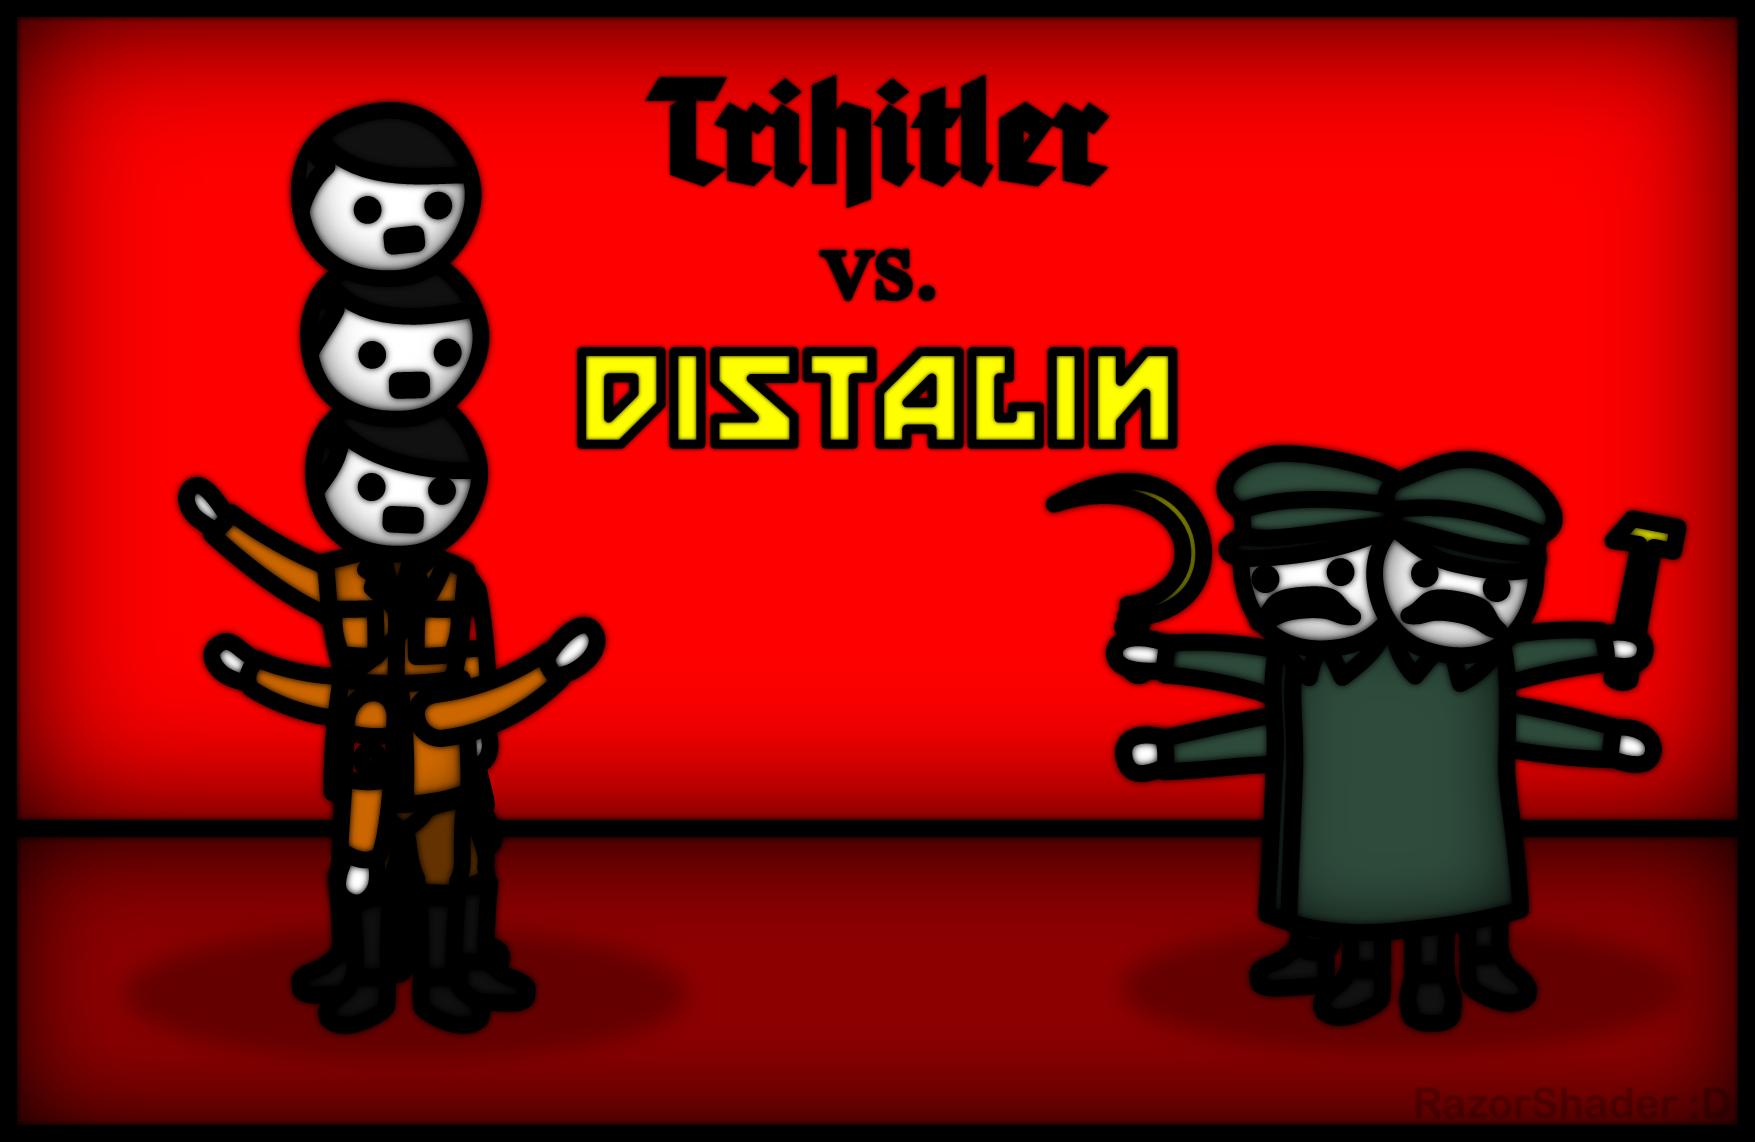 Trihitler vs Distalin